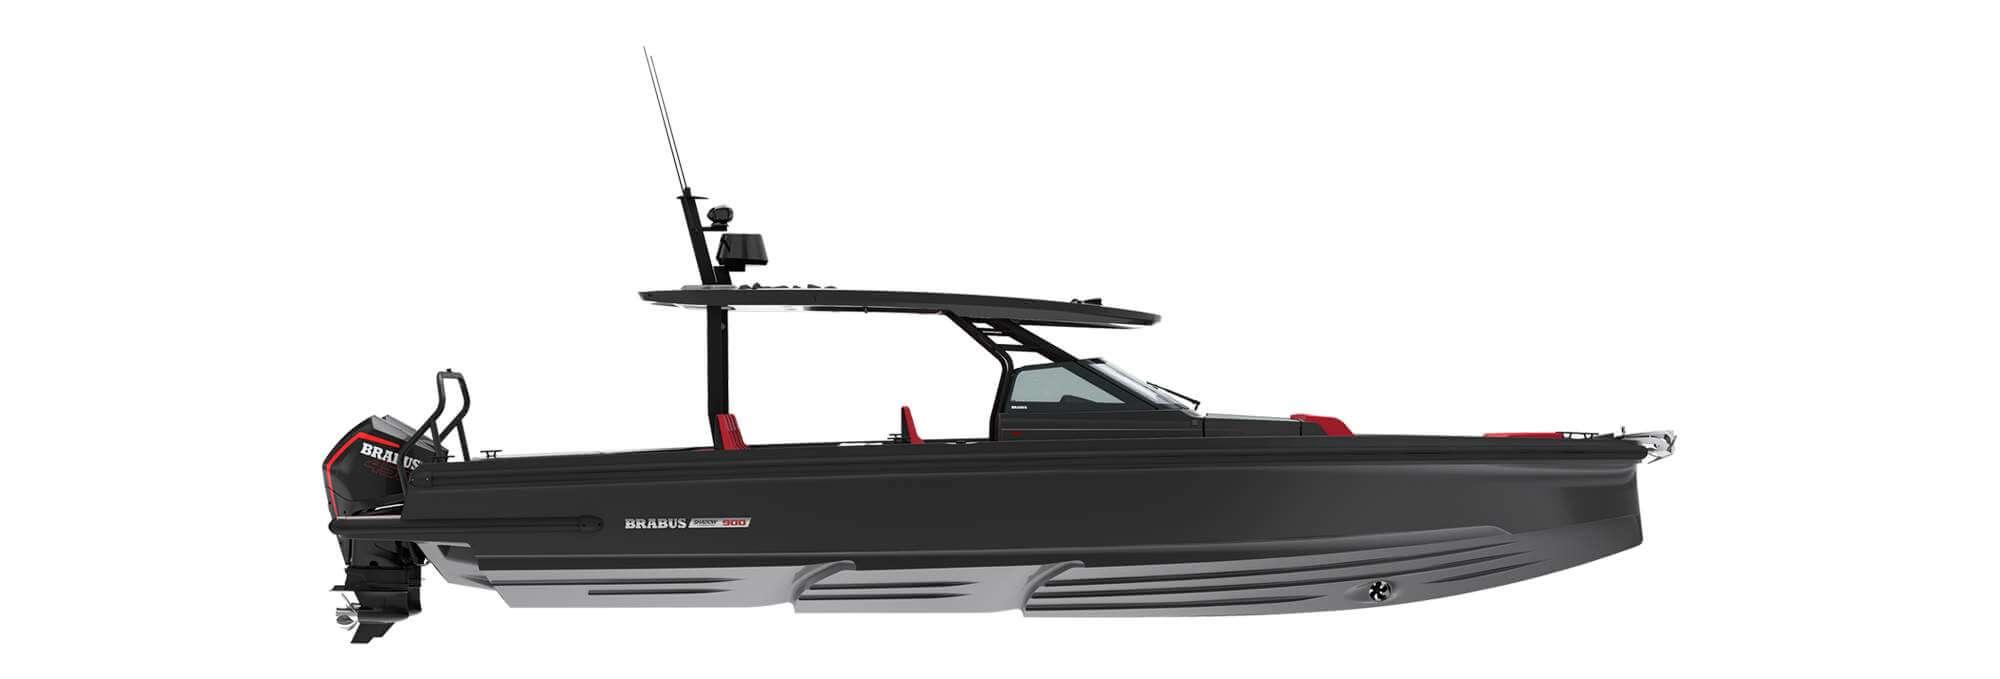 Brabus 90HP boat, Eyachts Australia and New Zealand